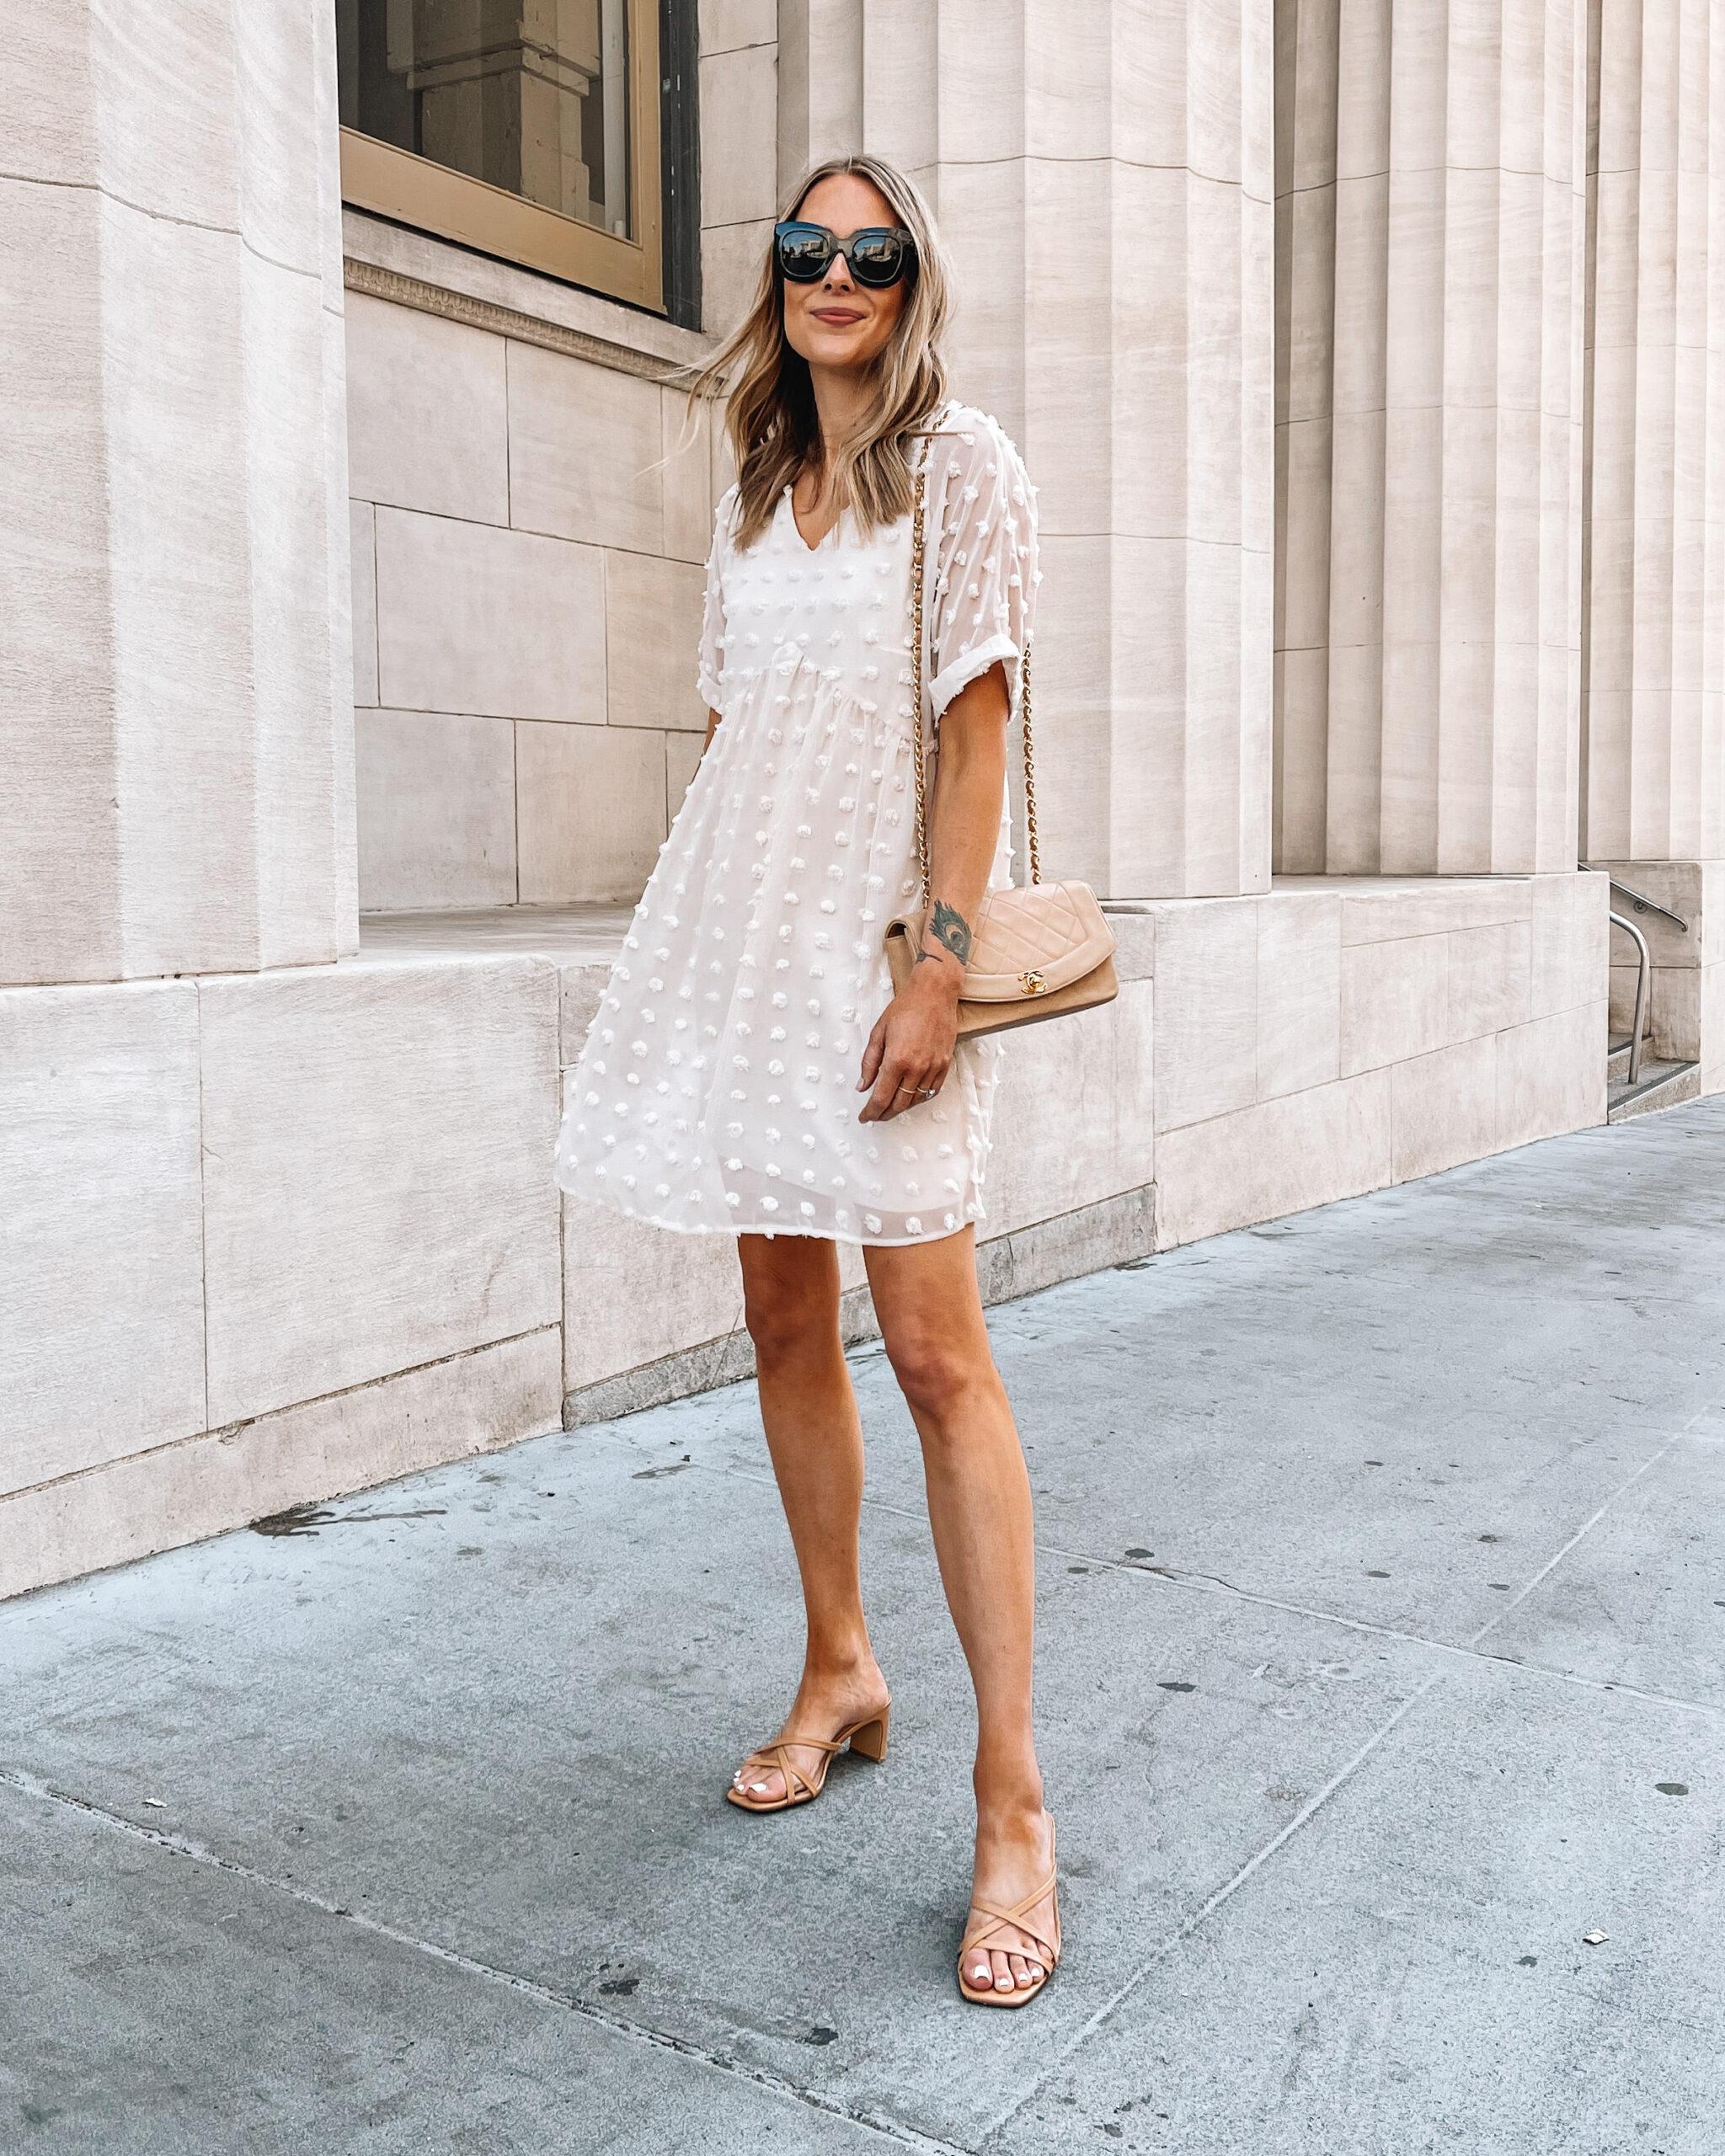 Fashion Jackson Wearing Amazon Fashion Beige Summer Dress Tan Heeled Sandals